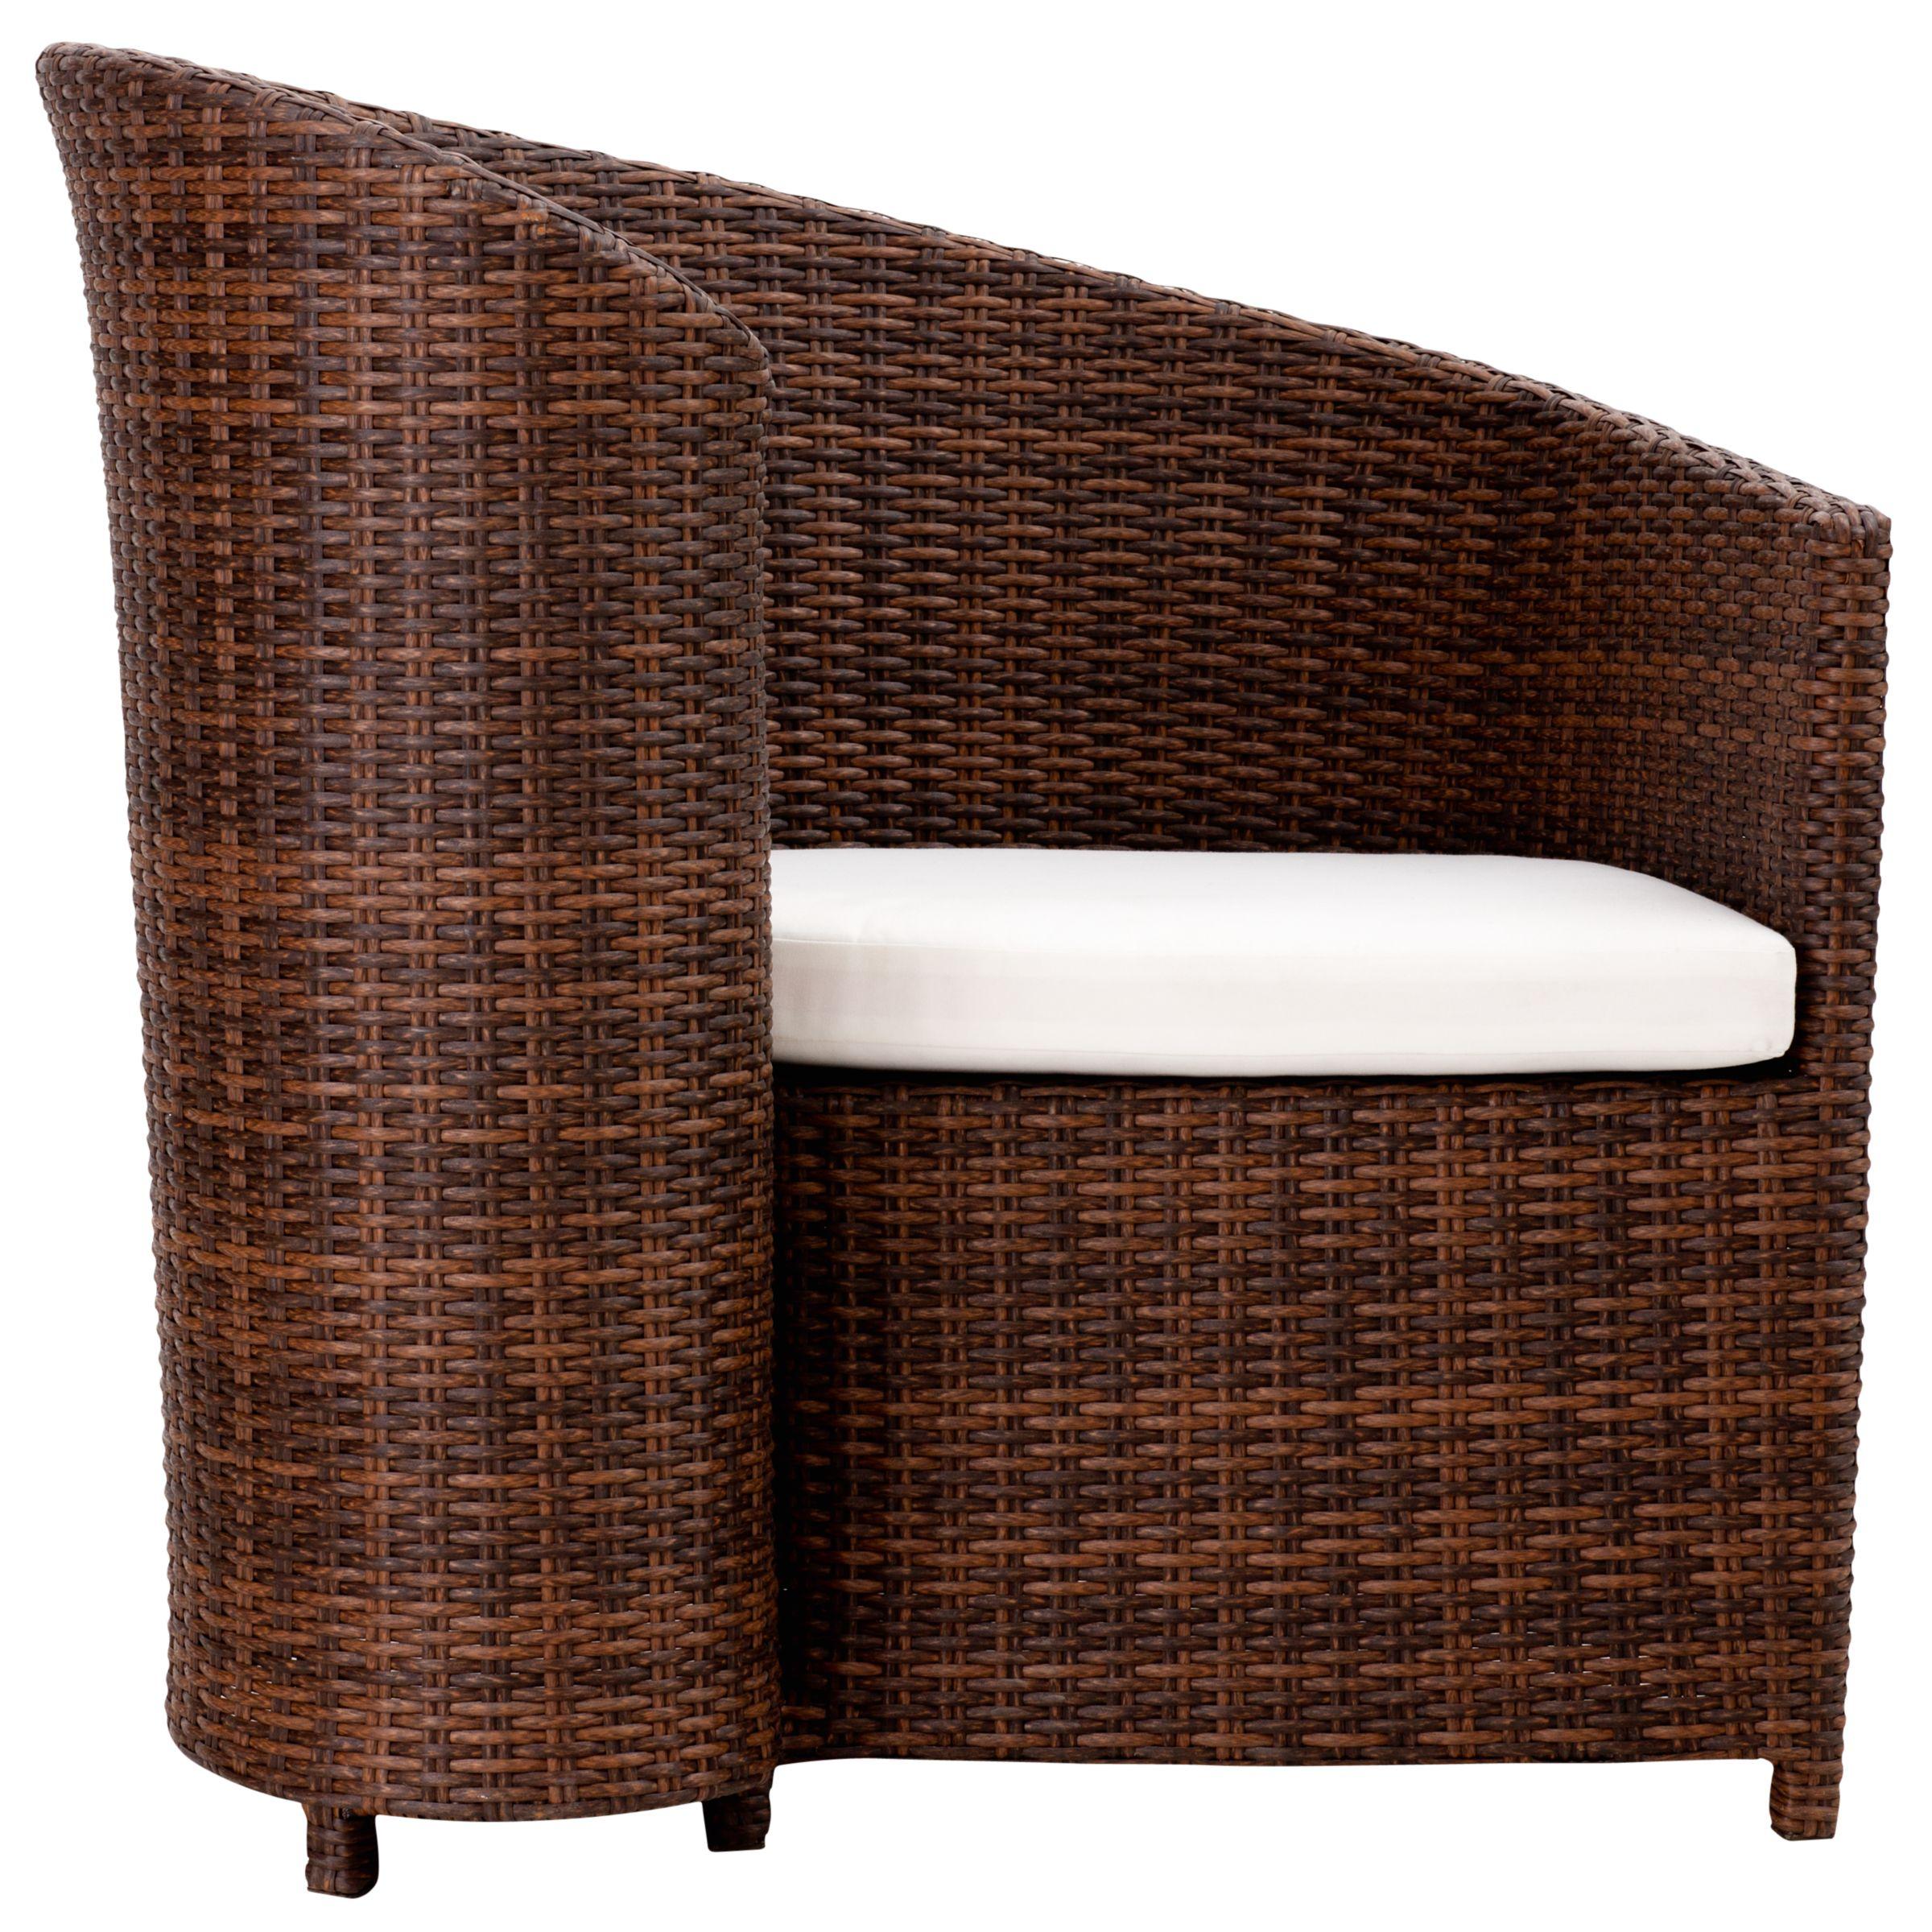 John Lewis Swirl Outdoor Chair